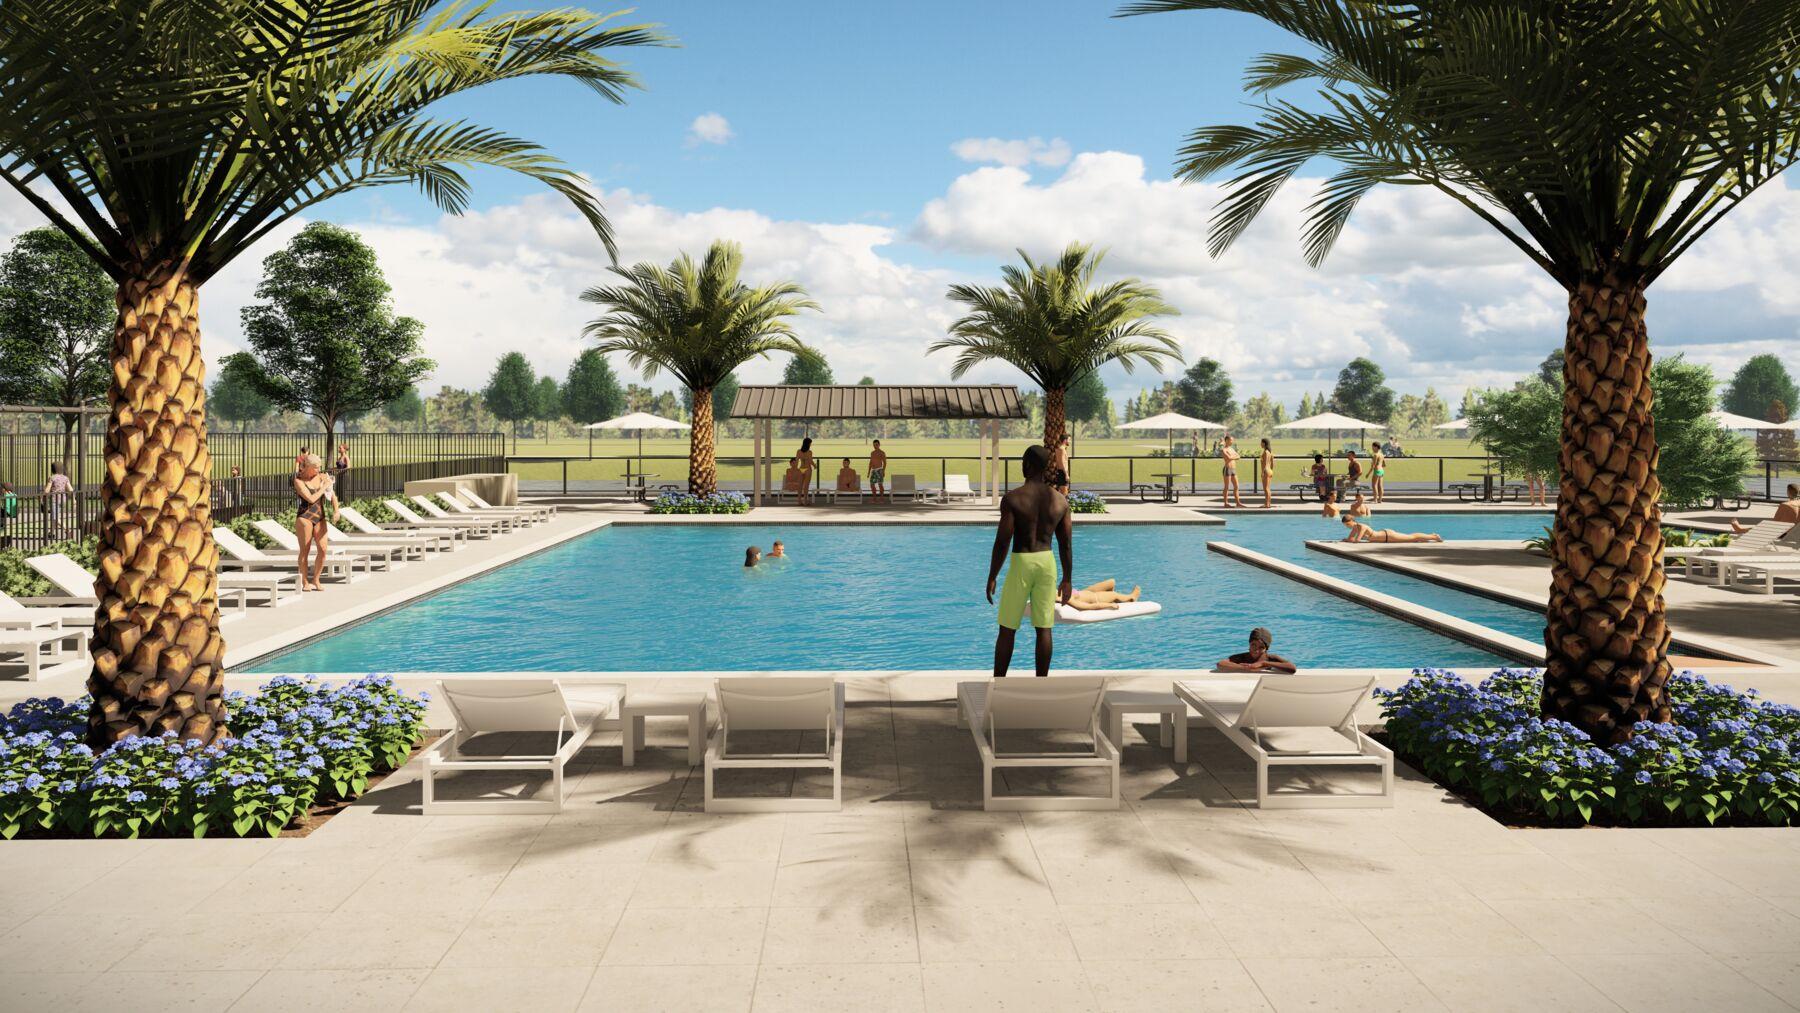 Rivington Pool